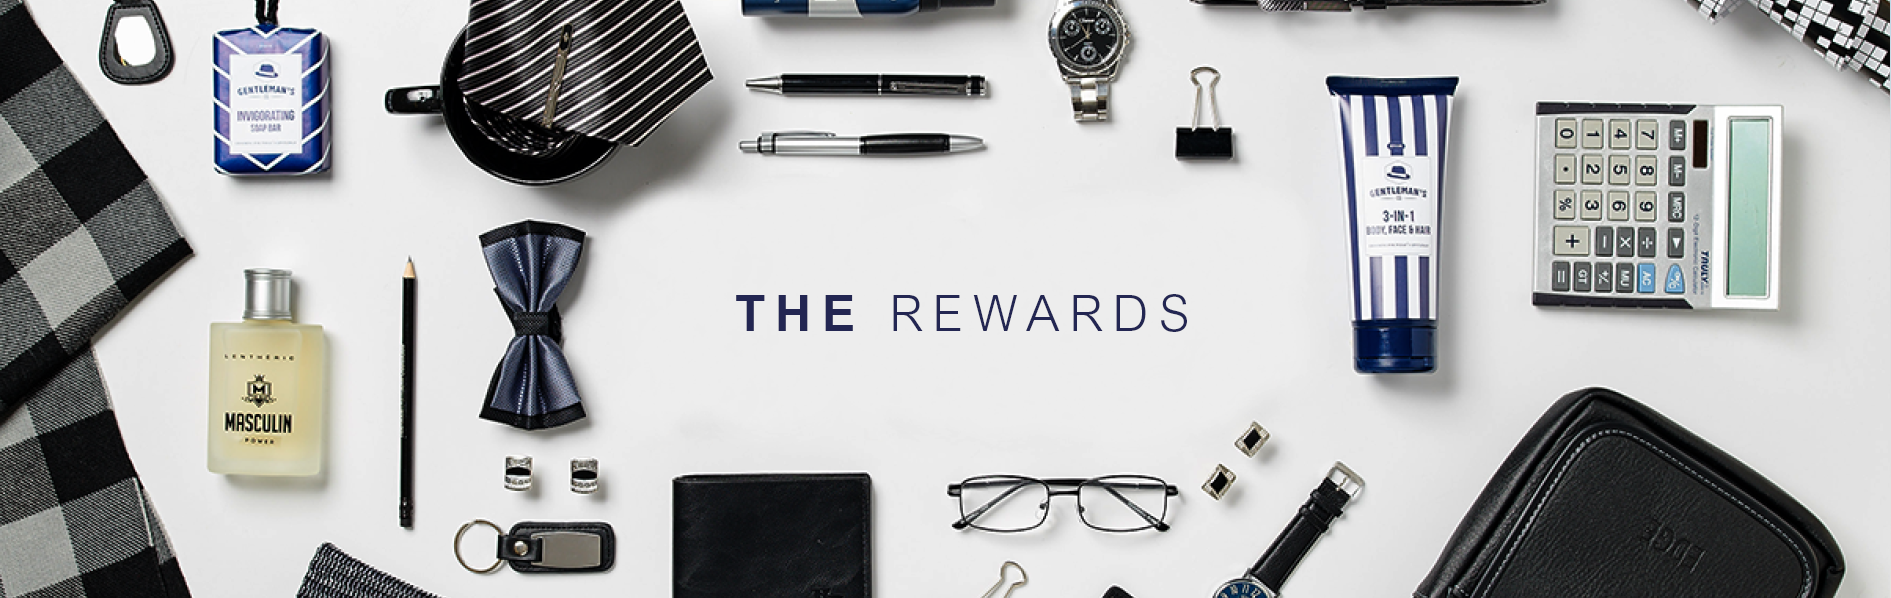 The rewards image